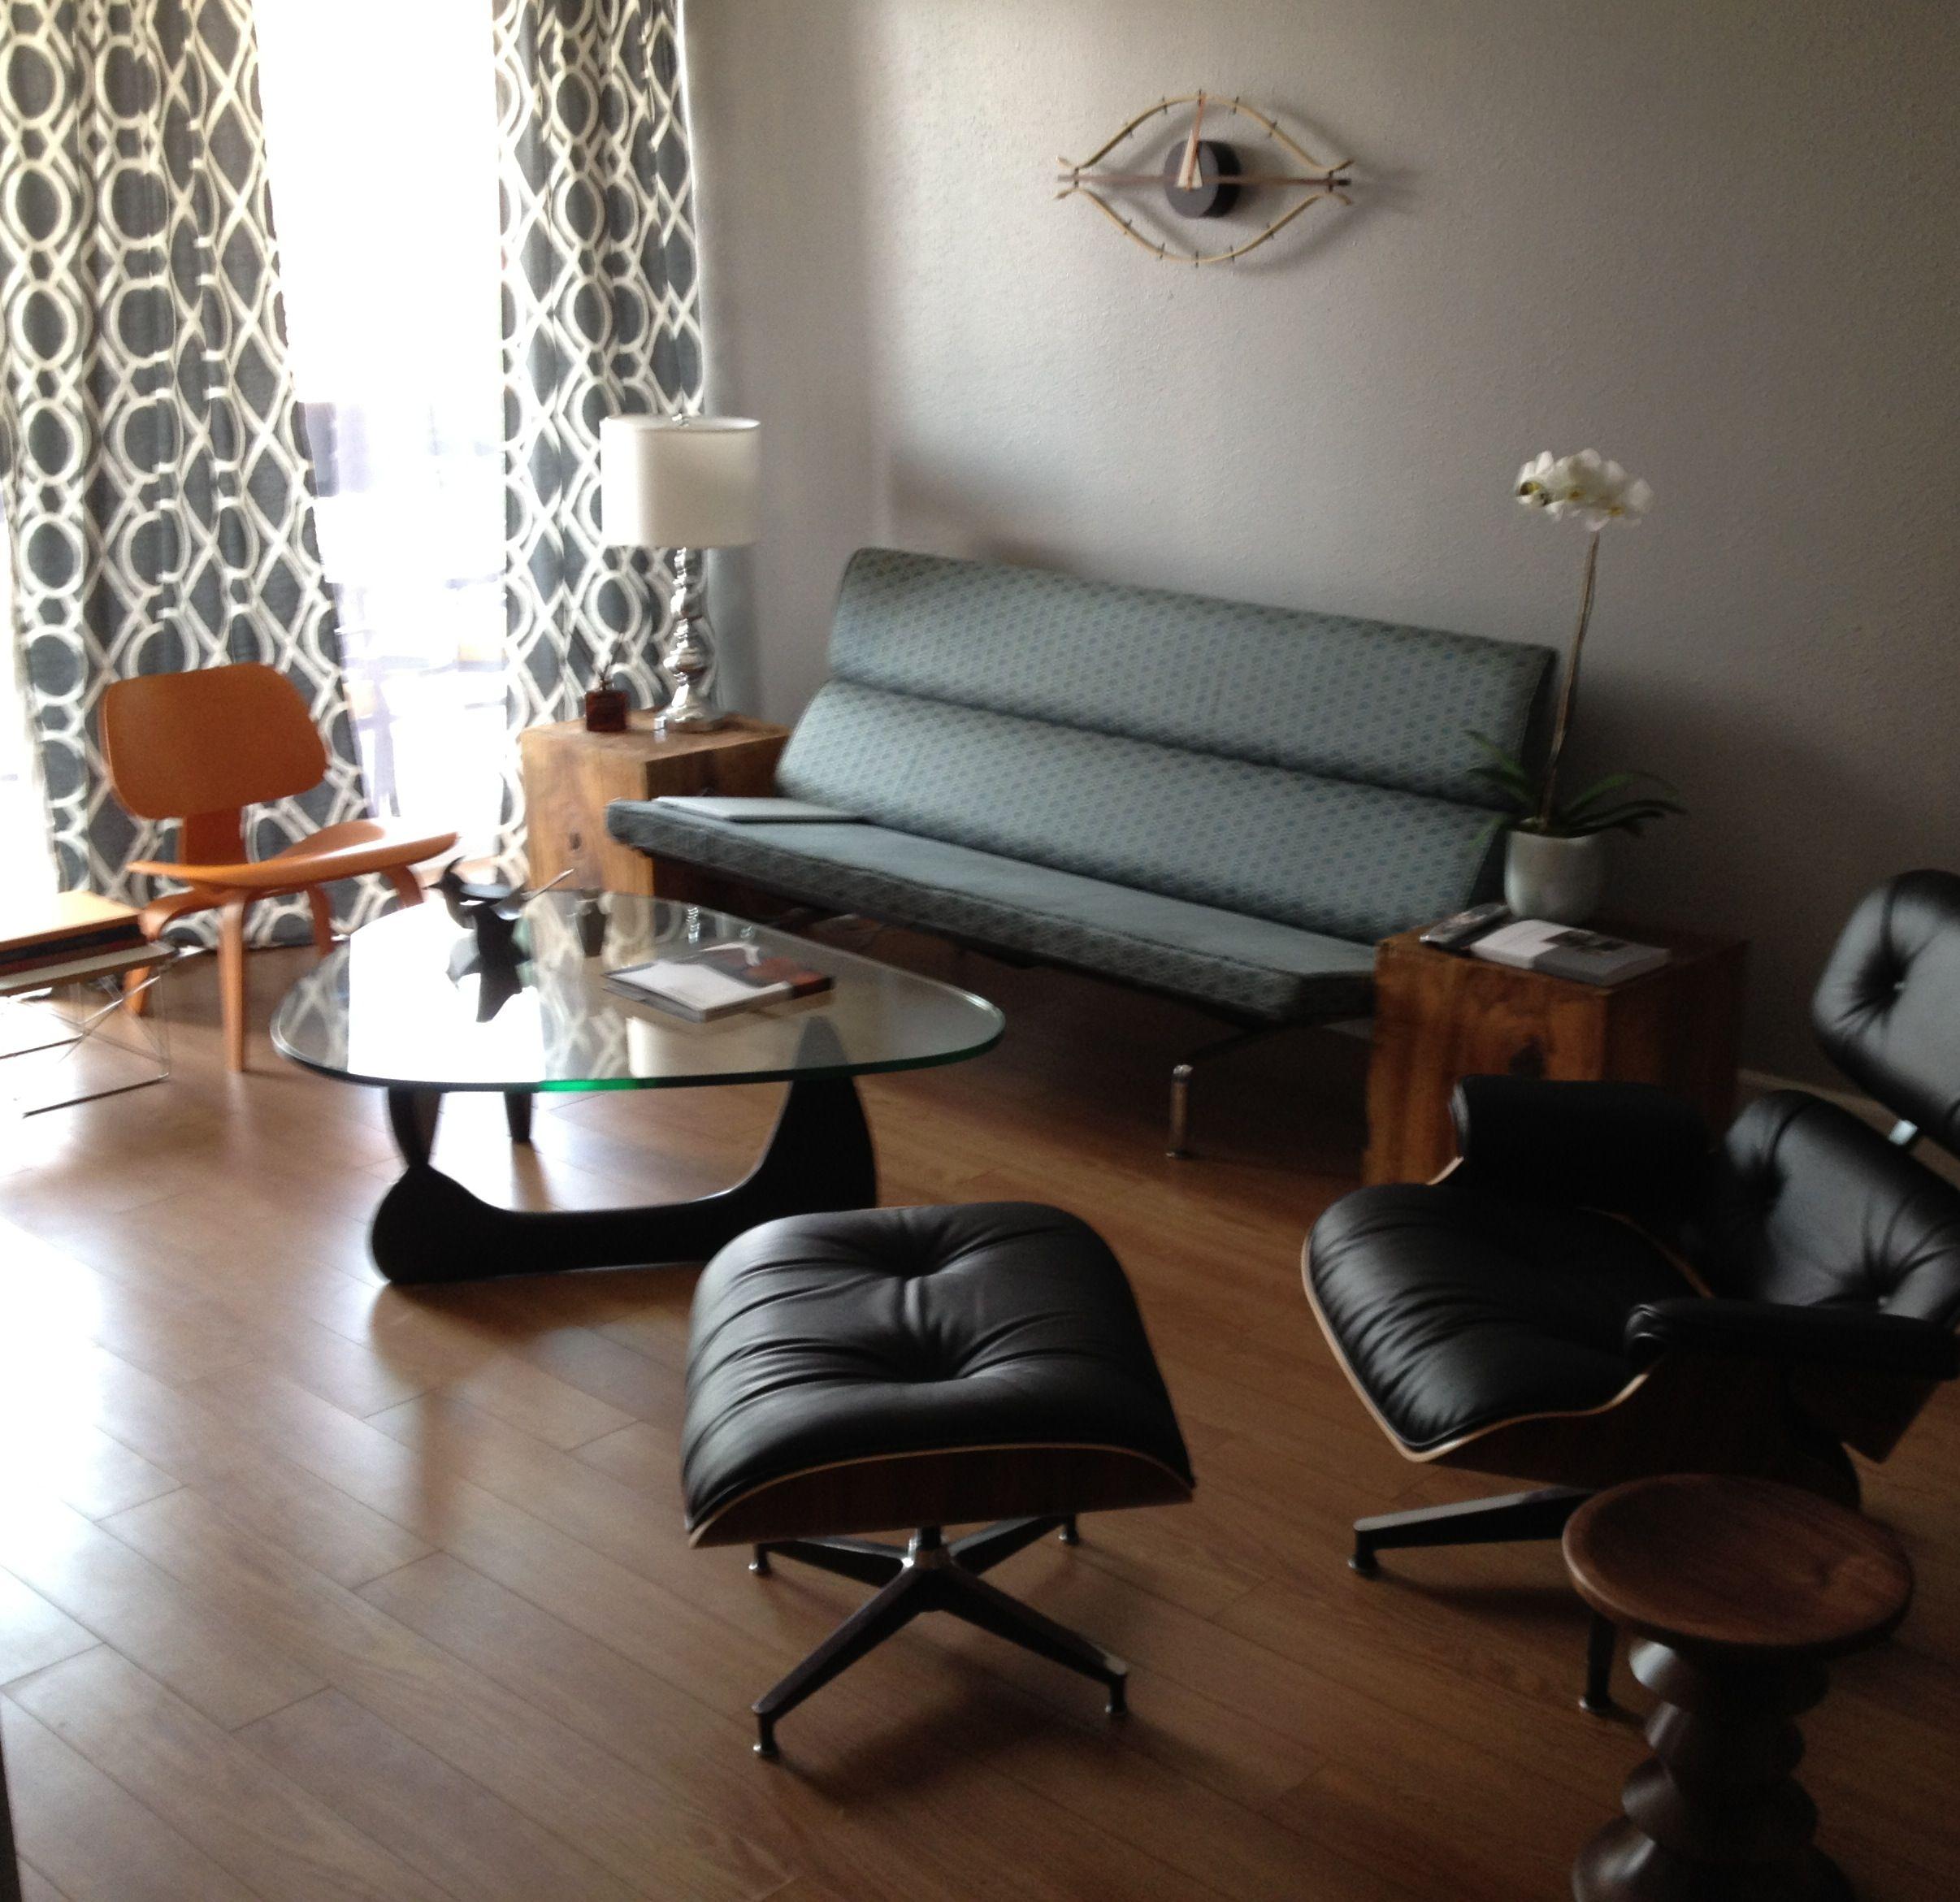 Eames Sofa Compact Warehouse Manchester Orange Lcw Lounge Chair Noguchi Table